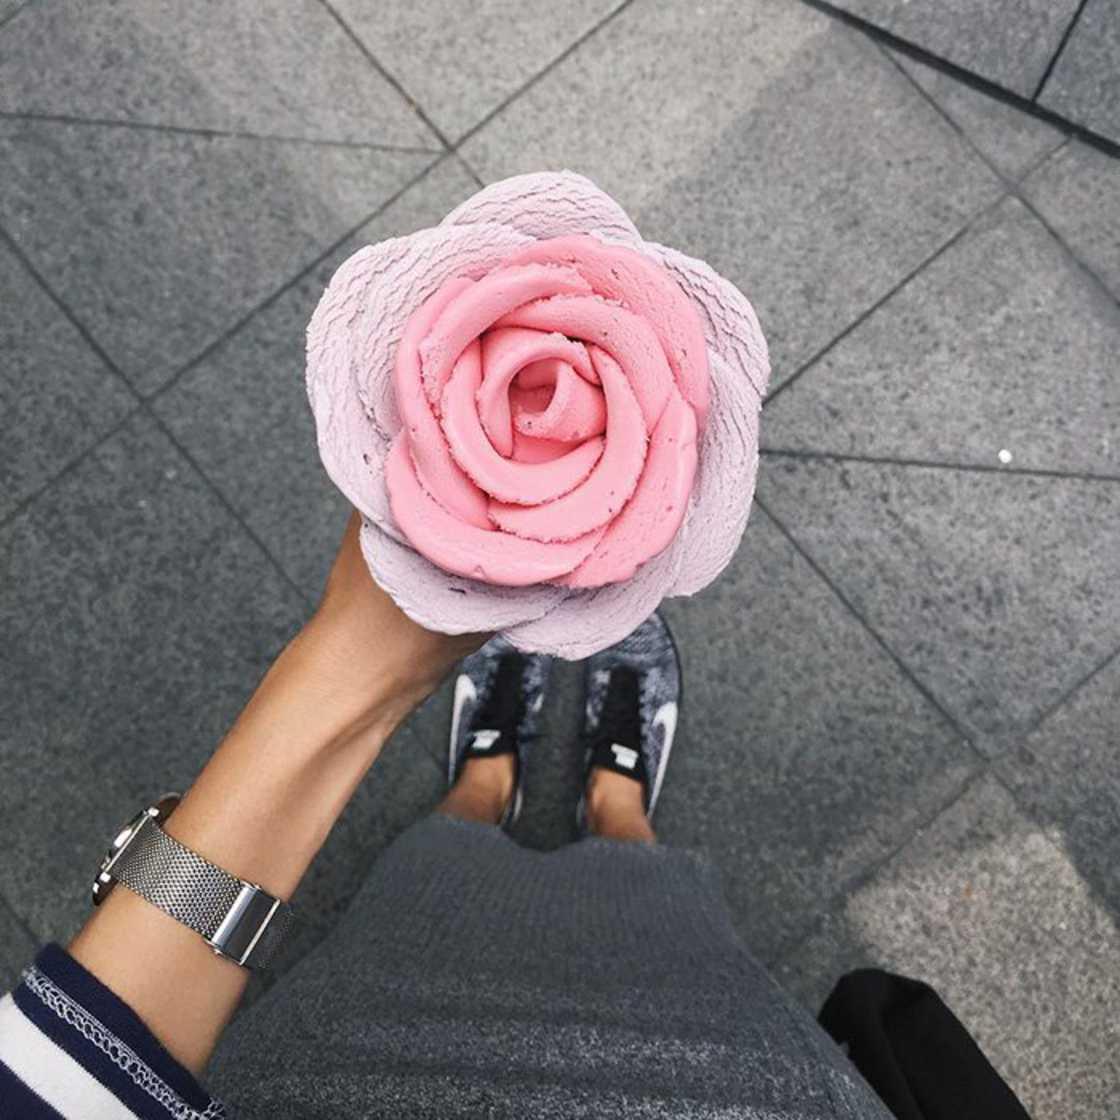 Amazing flower shaped ice cream cornets